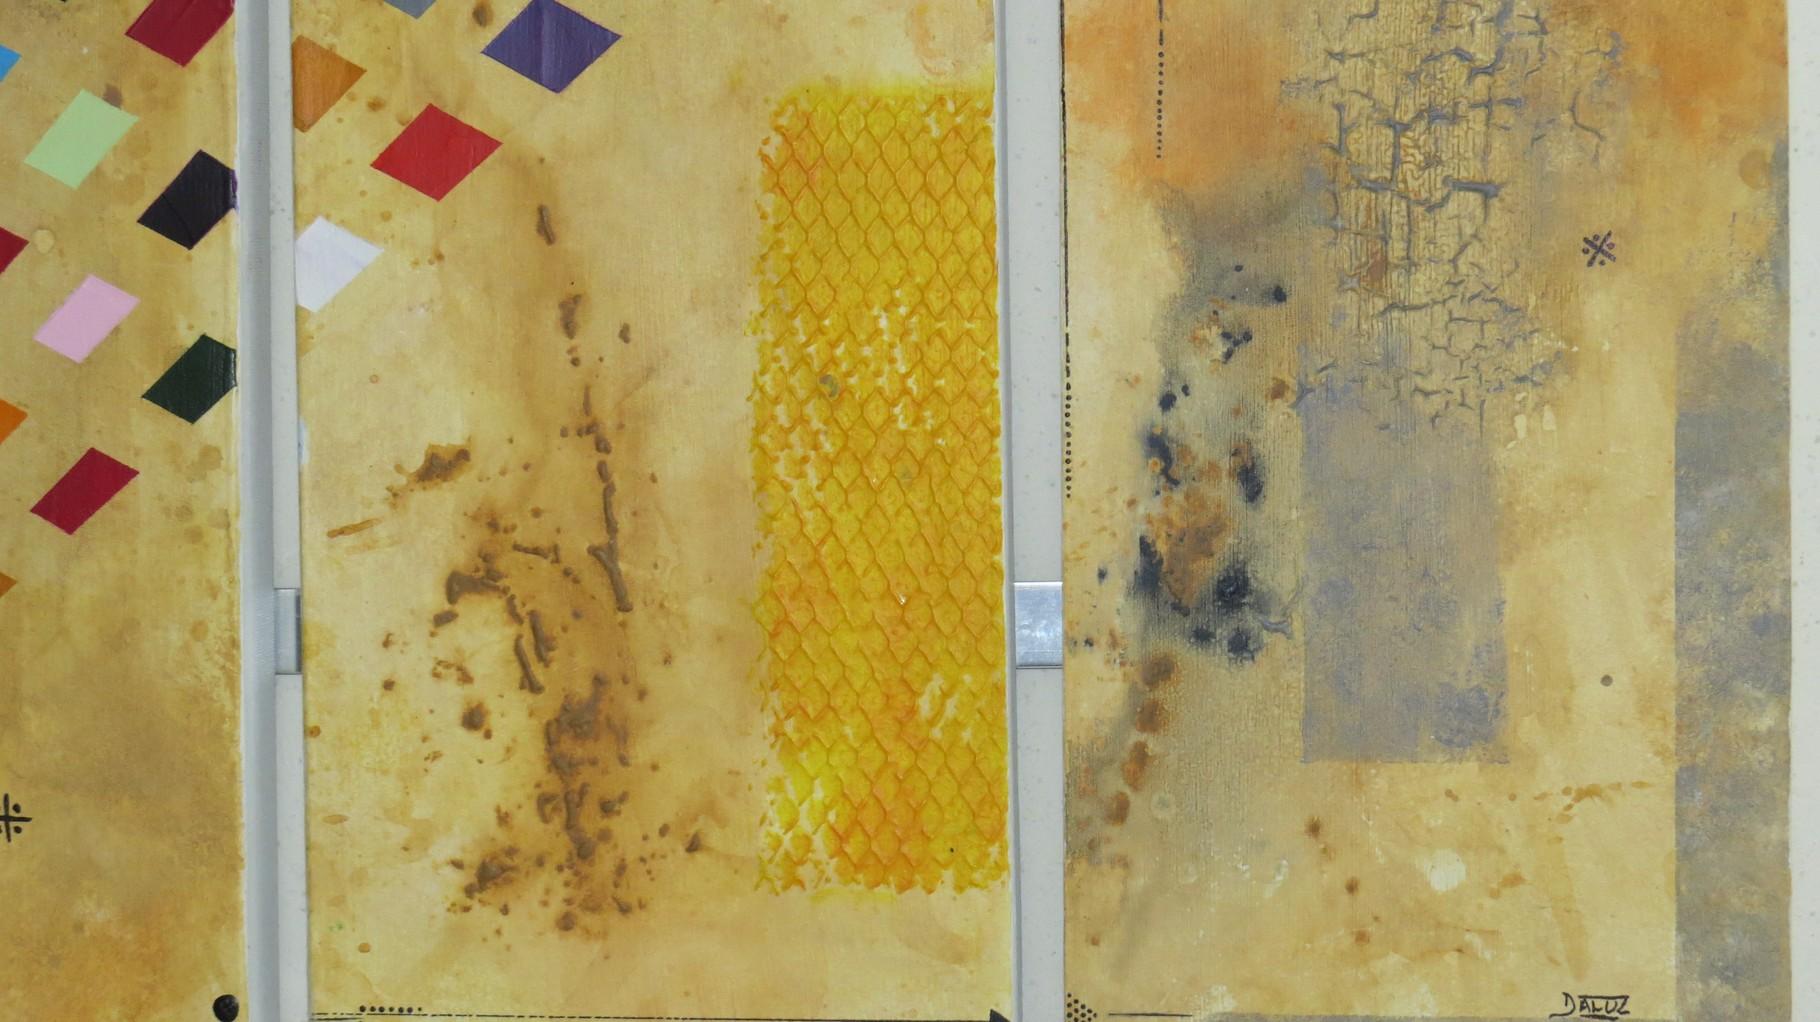 circuit imprimé zoom1 - daluz galego tableau abstrait abstraction